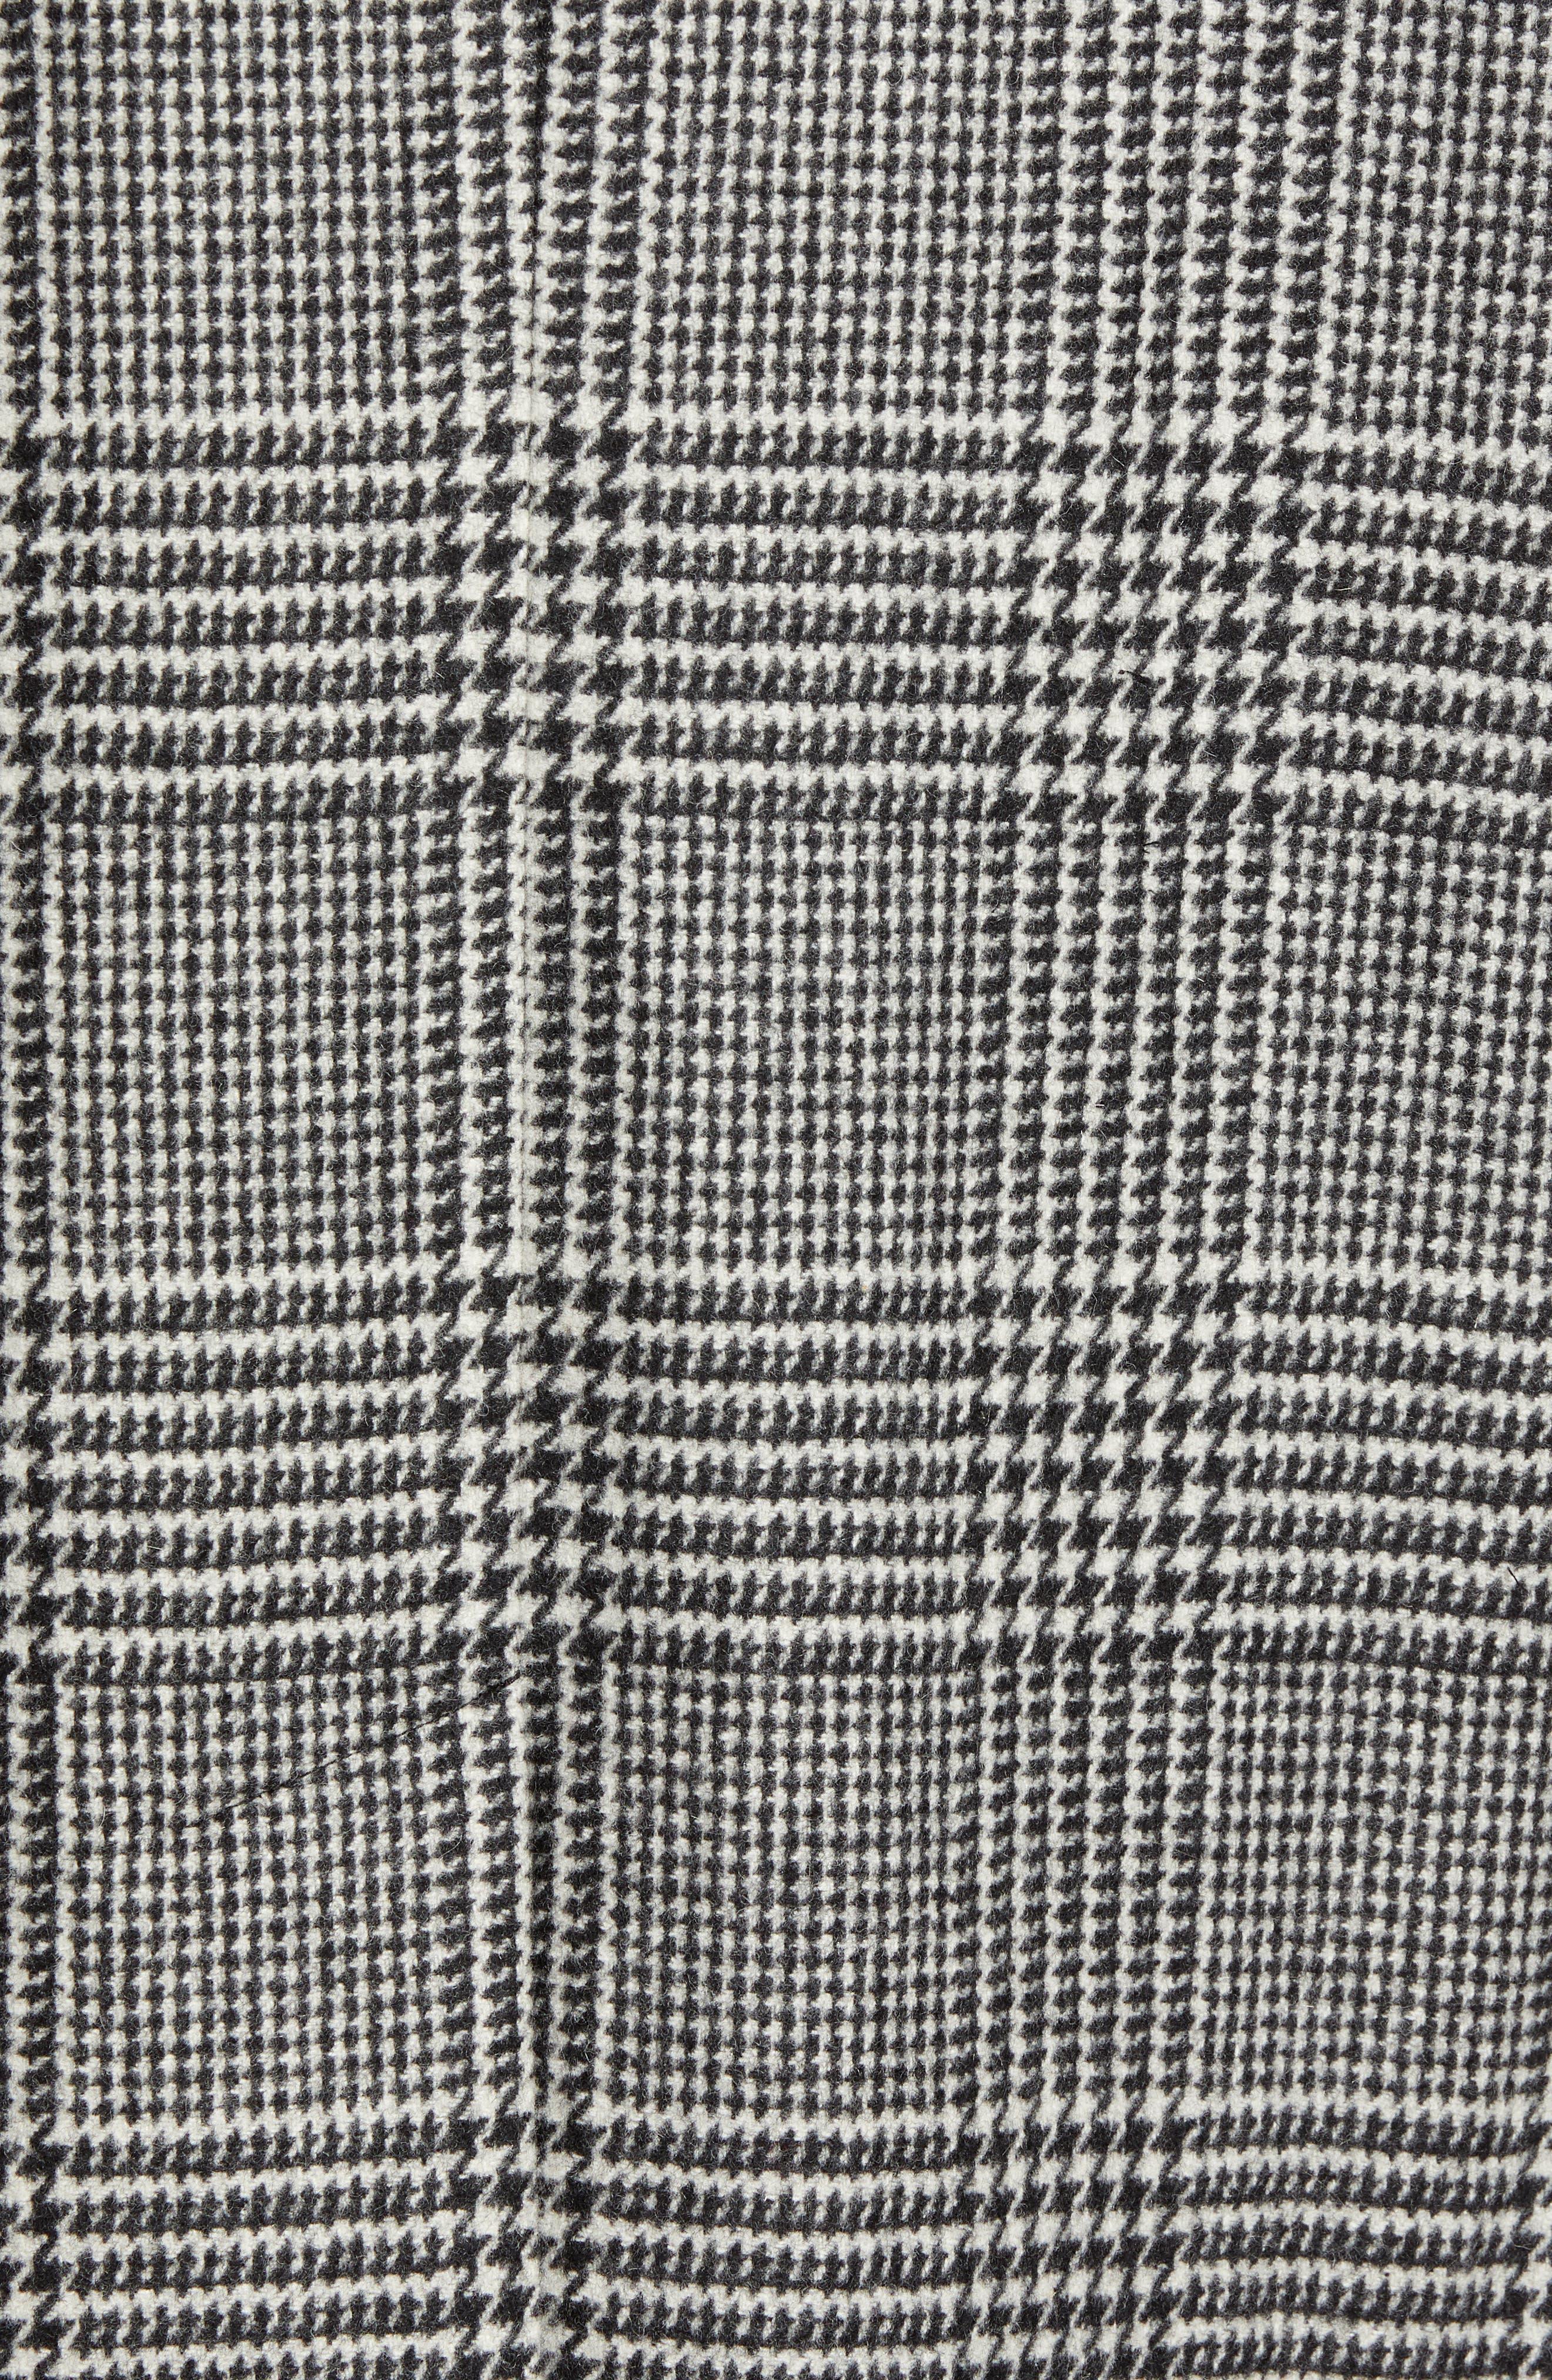 Ludlow Glen Plaid Topcoat,                             Alternate thumbnail 7, color,                             FUZZY GLENPLAID